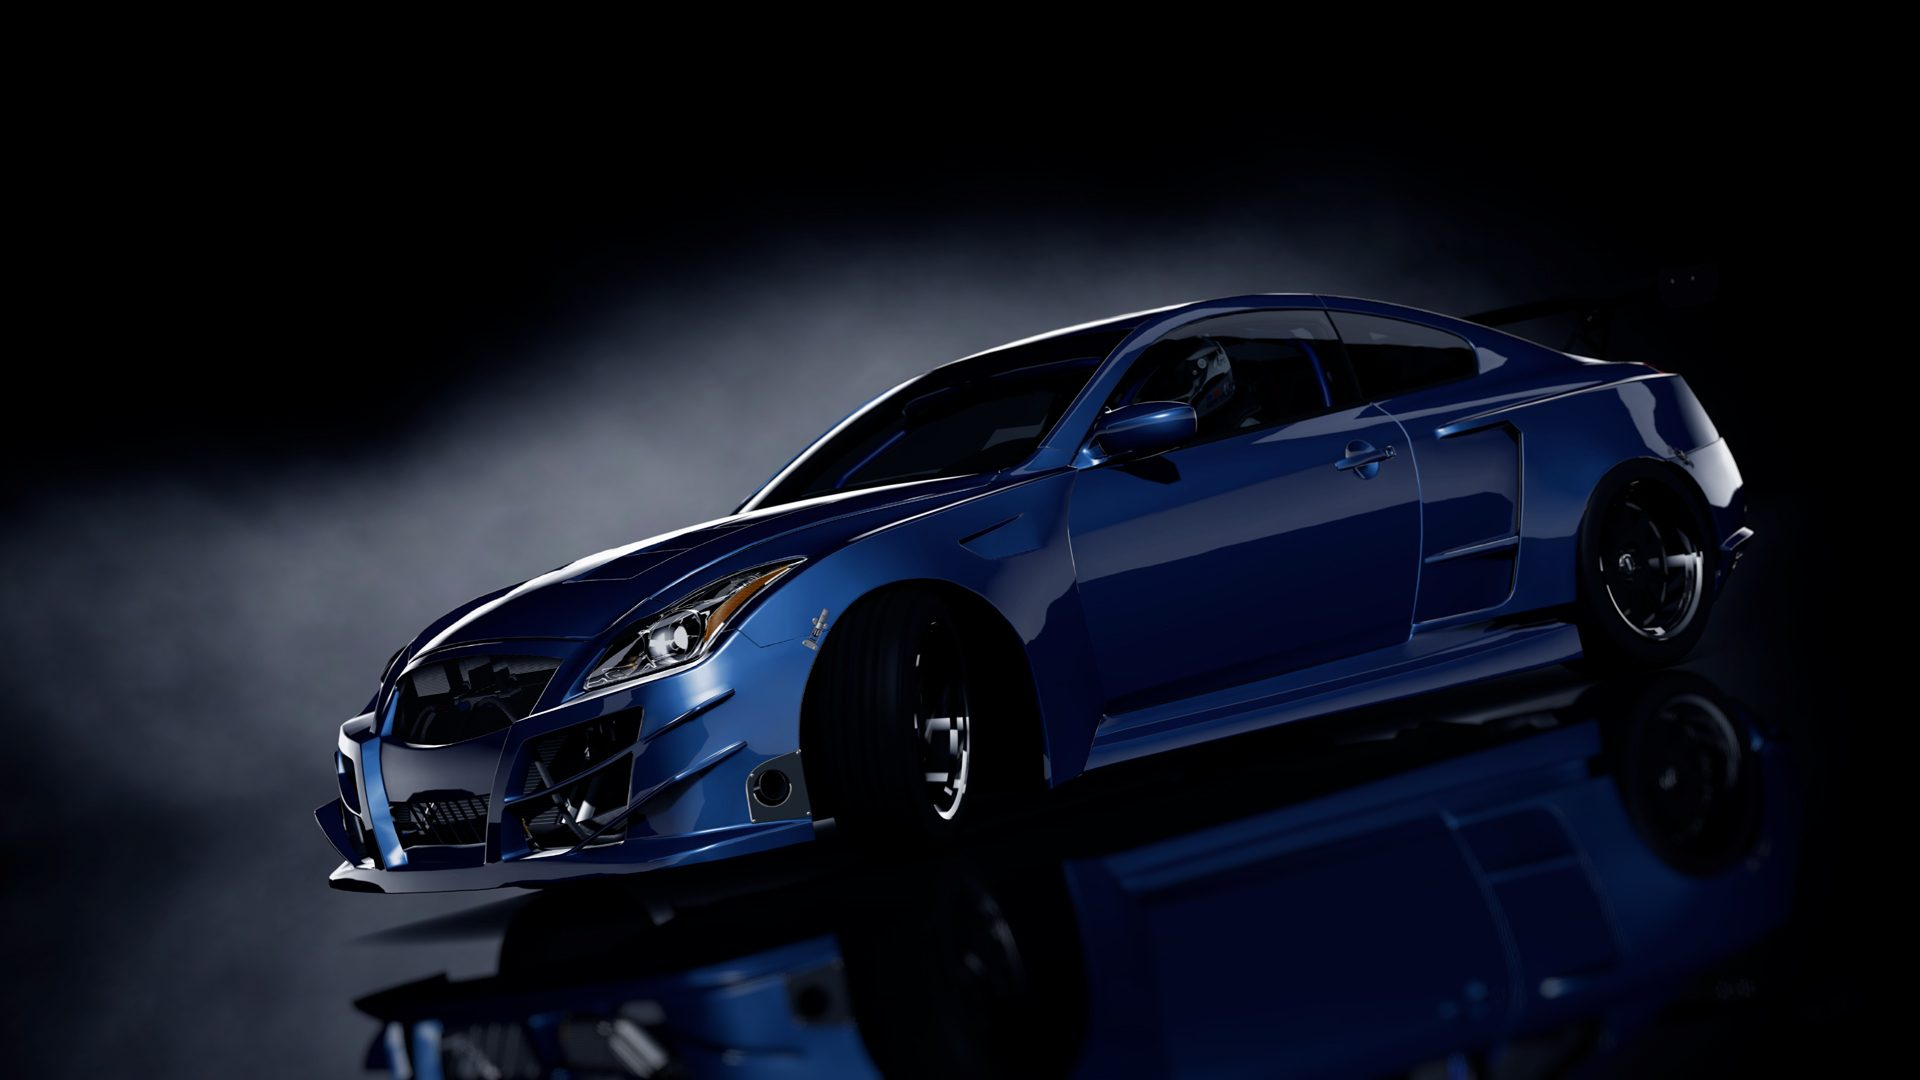 Gran Turismo 5: New Gran Turismo 5 Screenshots From SEMA 2009